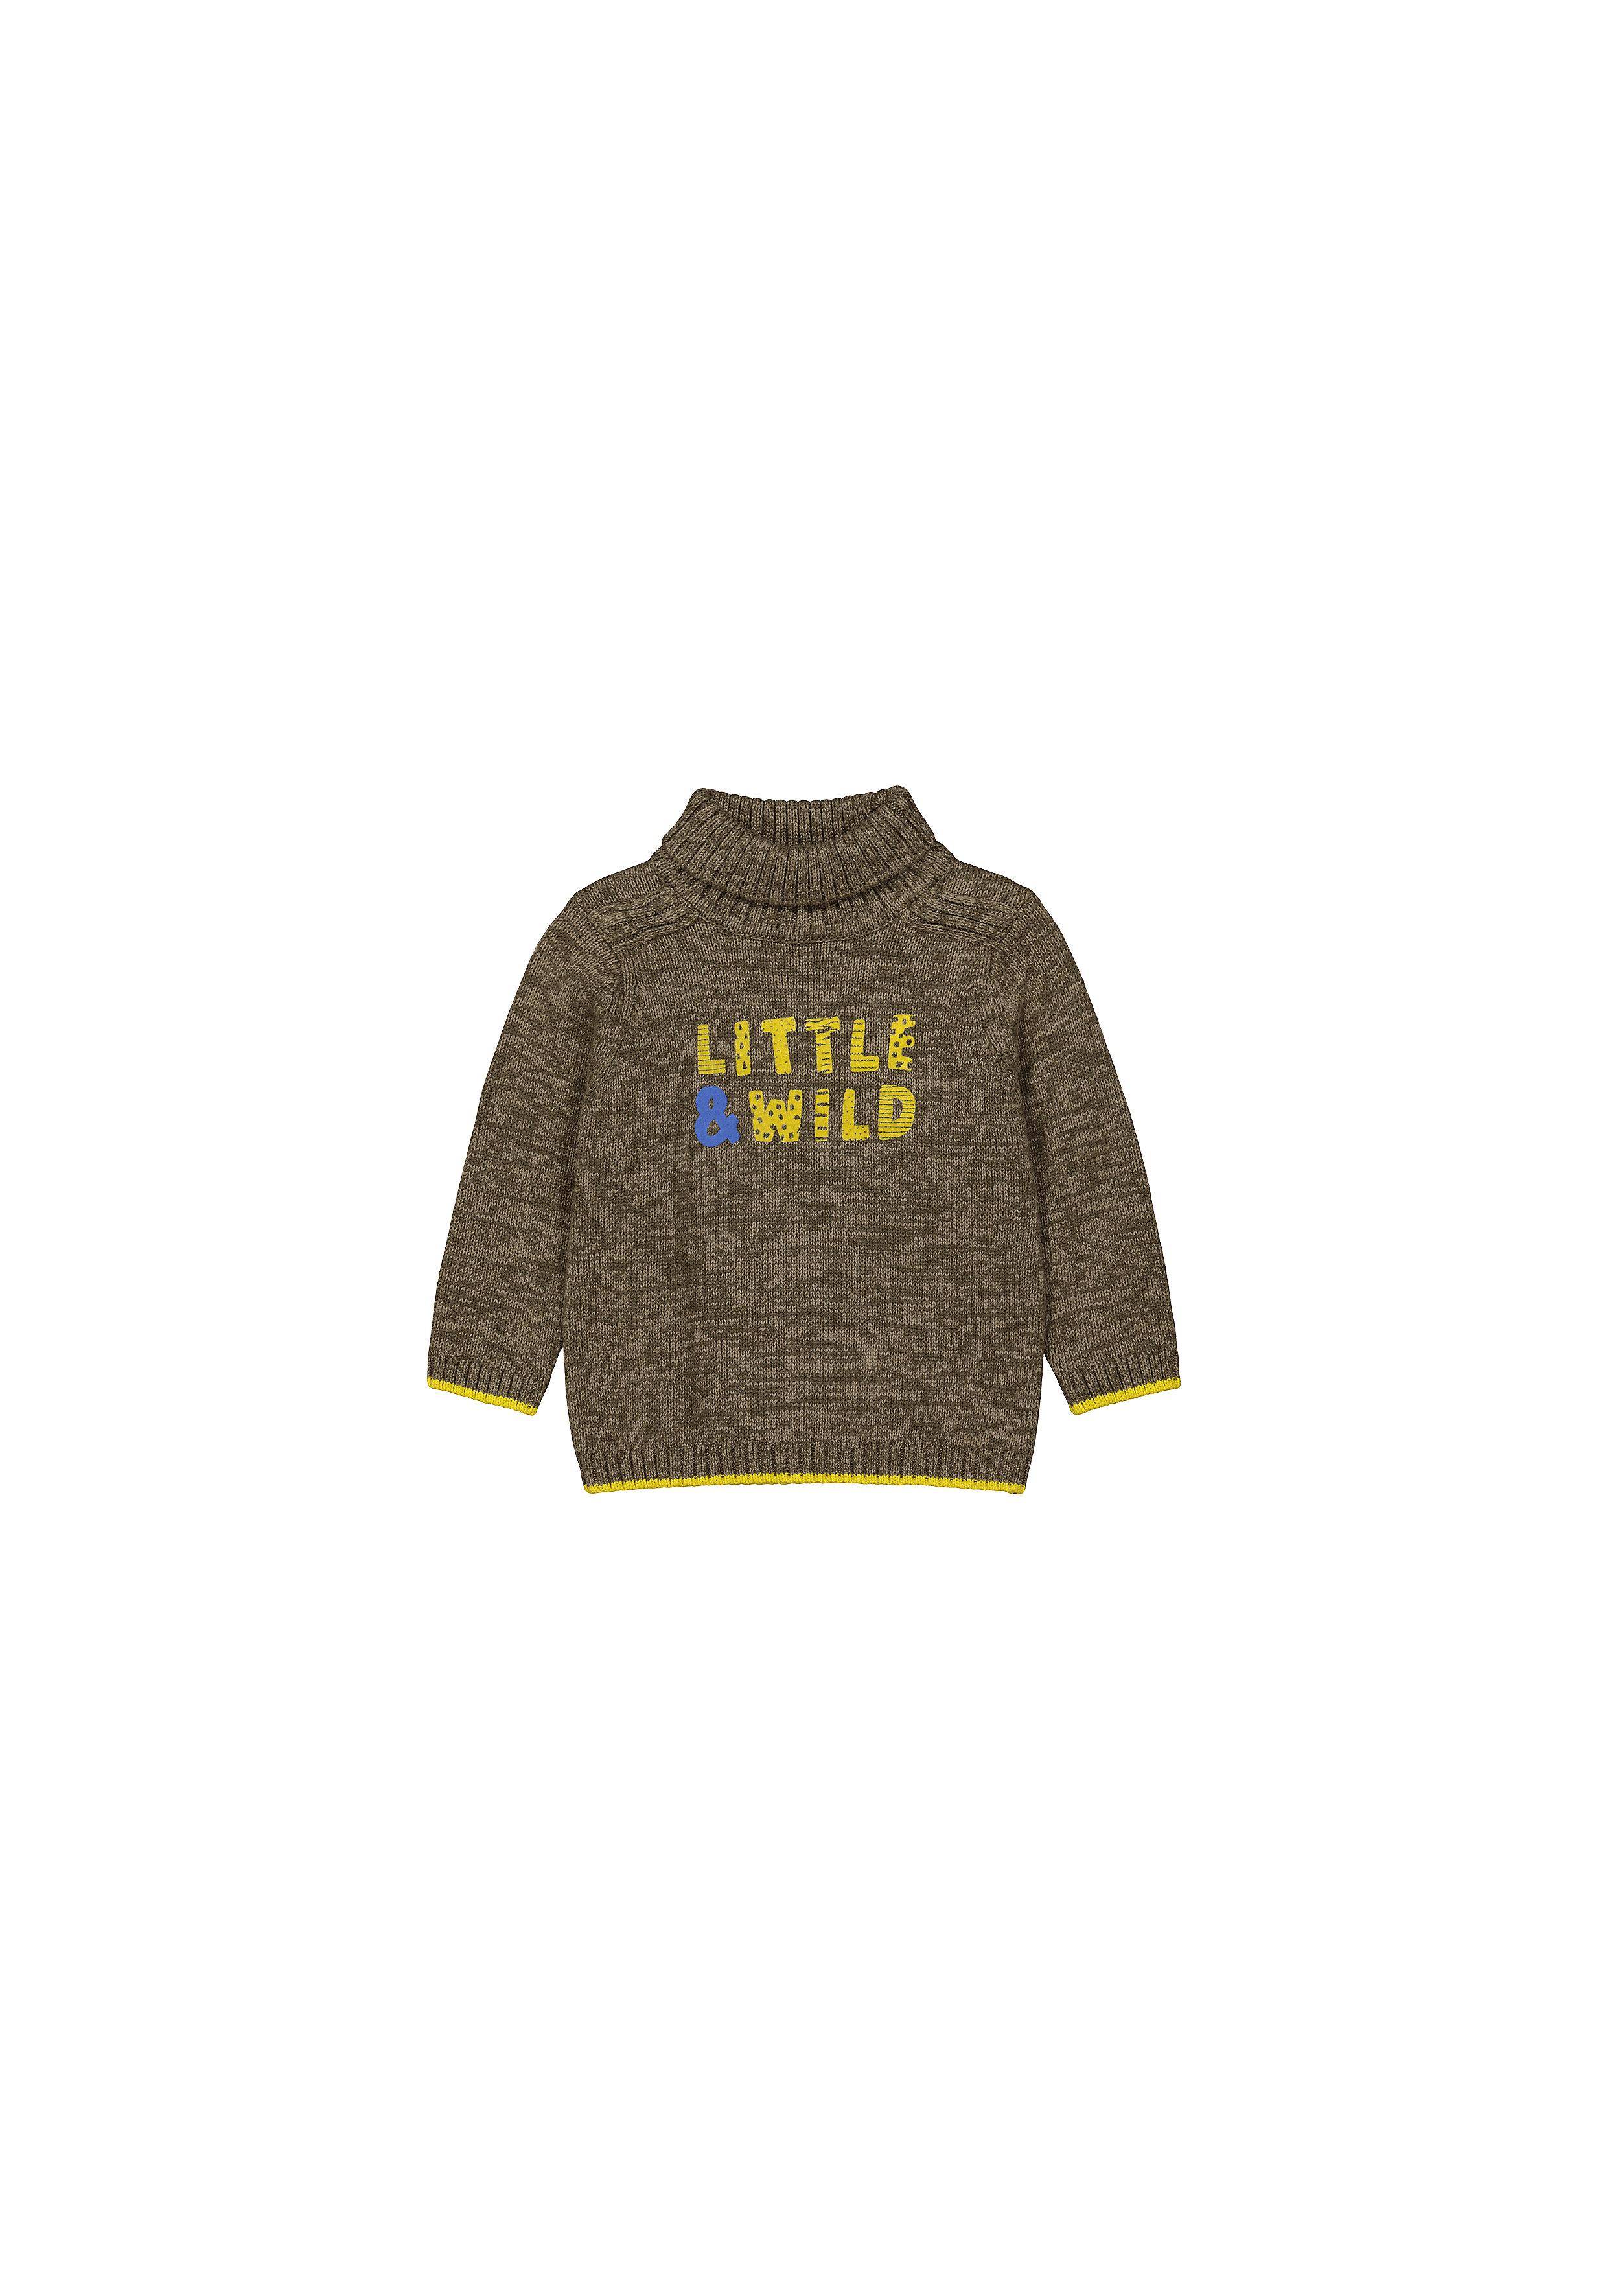 Mothercare   Boys Full Sleeves Sweater Text Print - Khaki